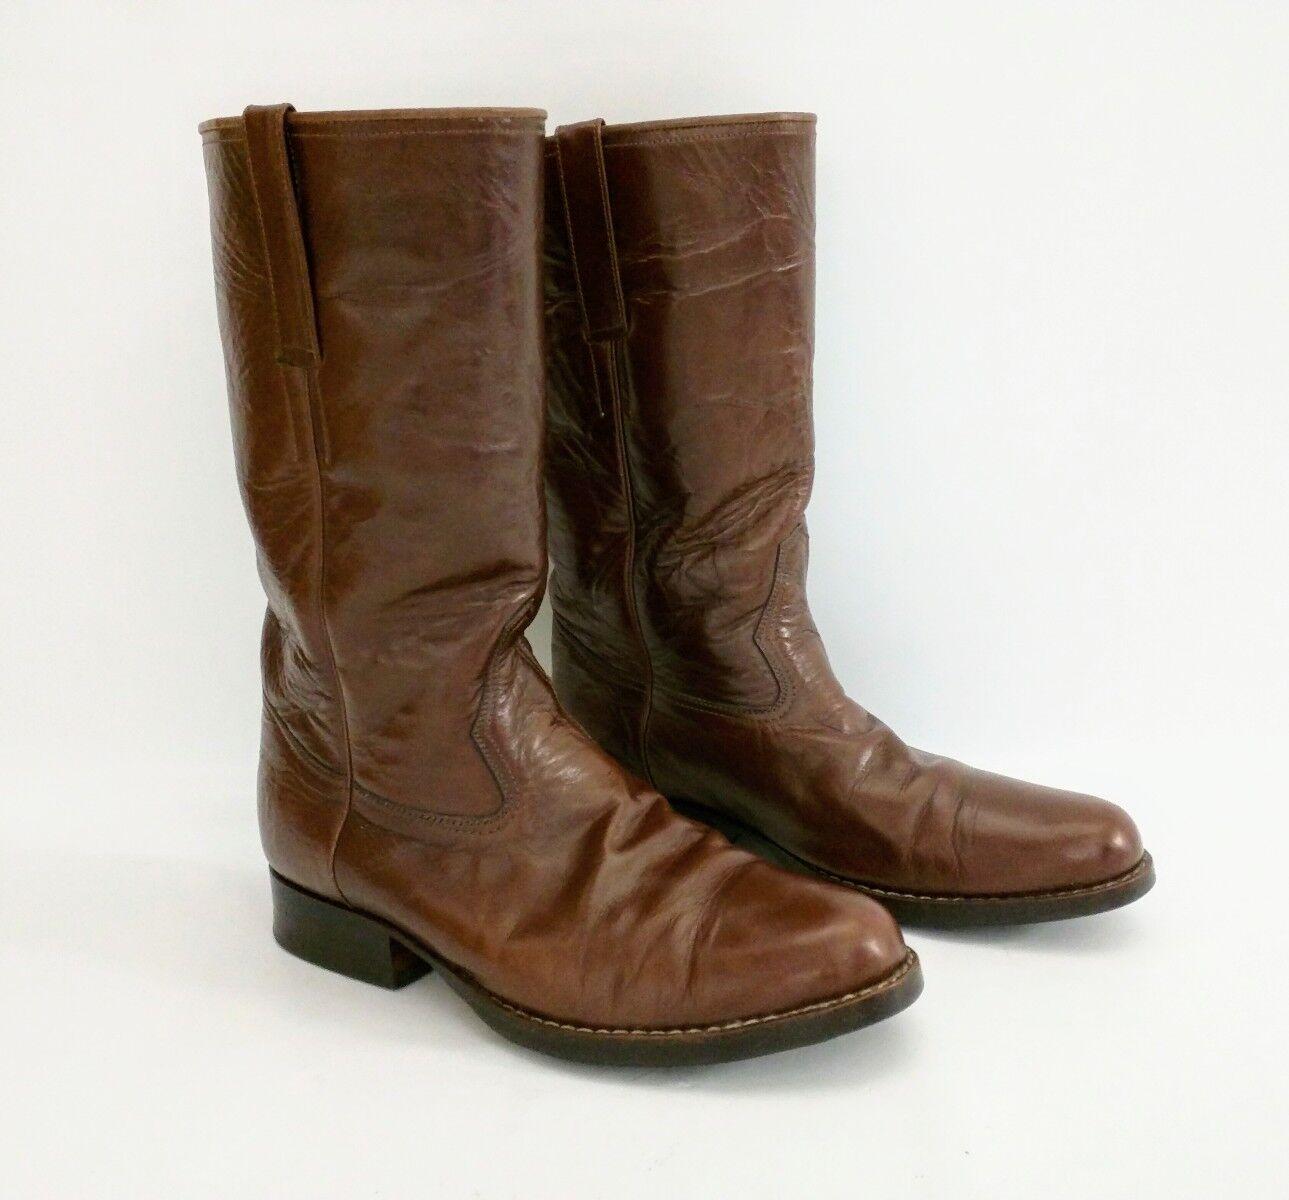 LA MUNDIAL Brown Leather RIDING Boots SIZE 9D